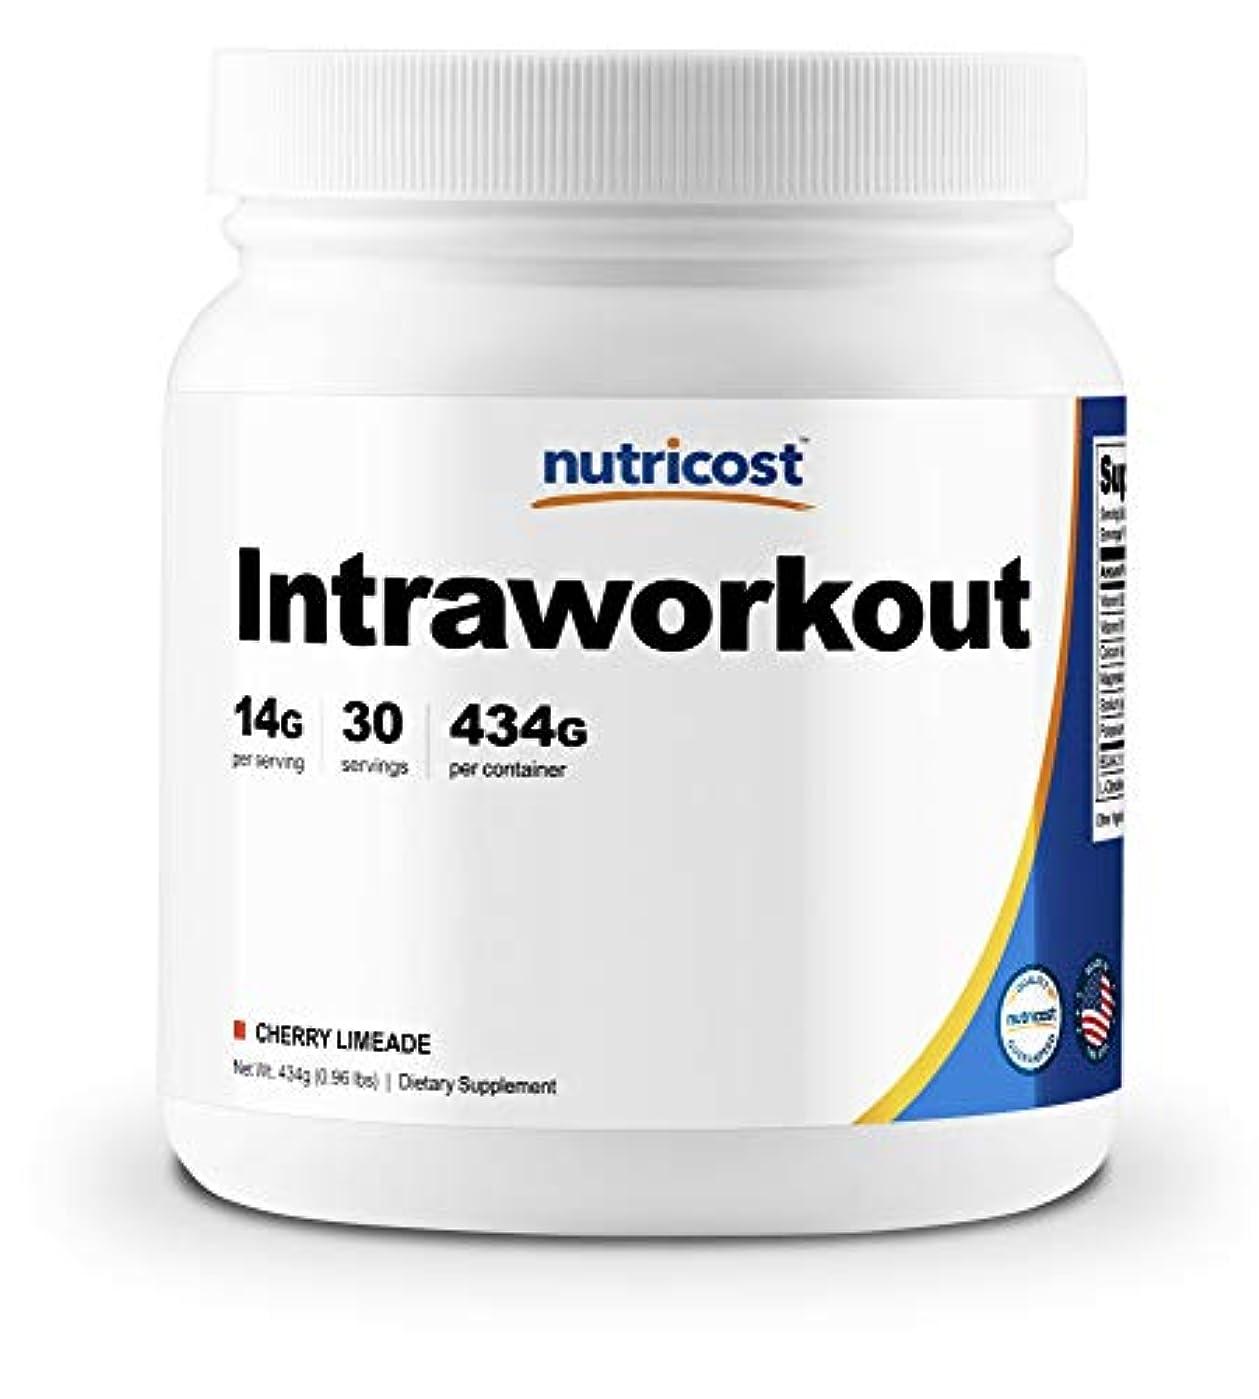 Nutricost イントラワークアウトパウダー(チェリーライムエード味)、非GMO、グルテンフリー